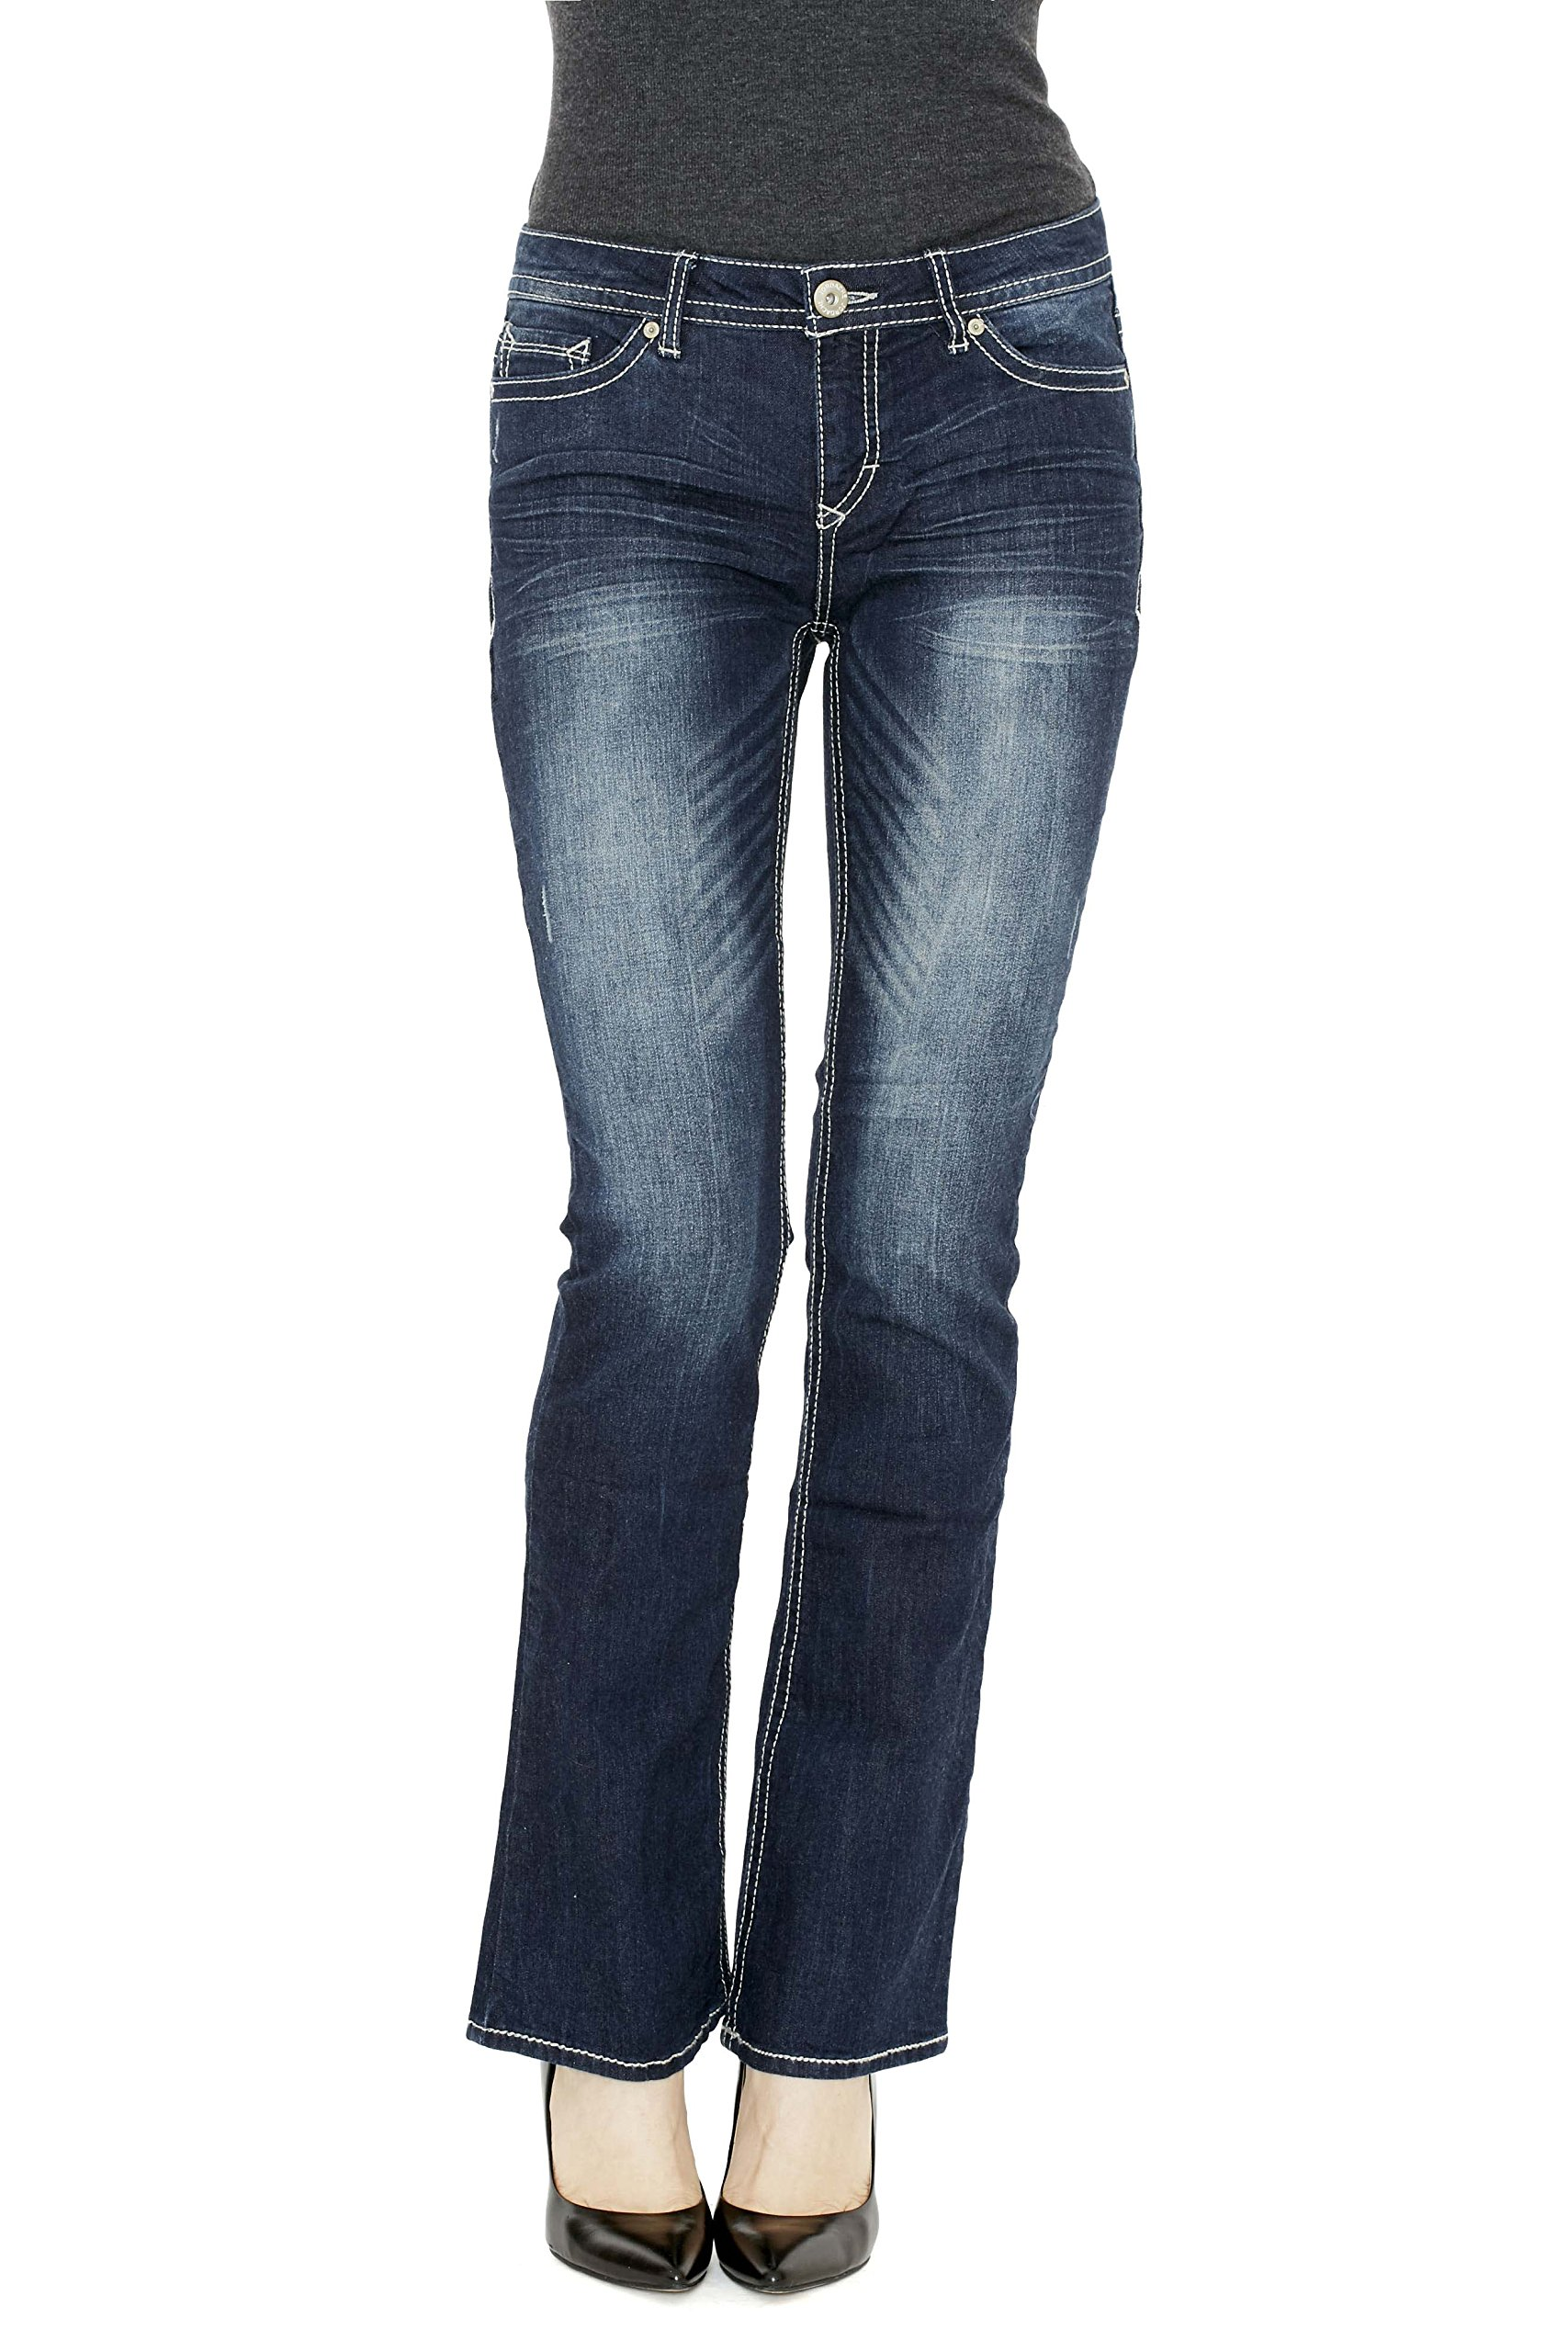 Stylish Designer Jeans Premium Stretch Slim Boot Denim Jeans for Women Mid Rise (14, Darkwash)